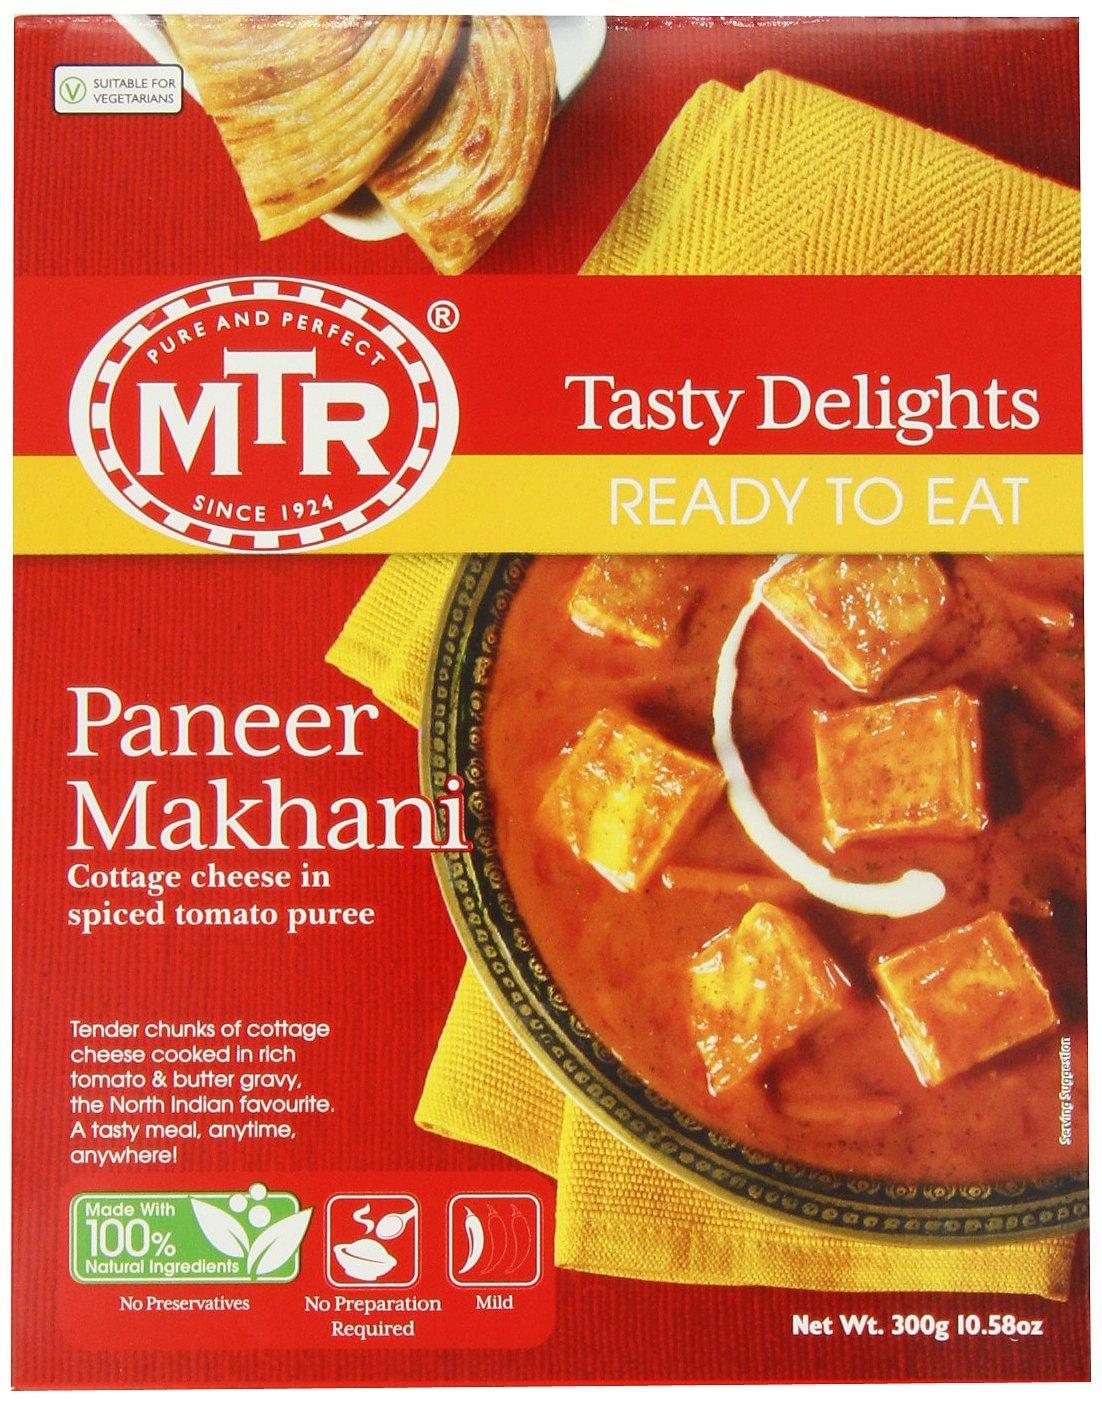 Mtr Paneer Makhani 印度蕃茄奶酪即食調理包